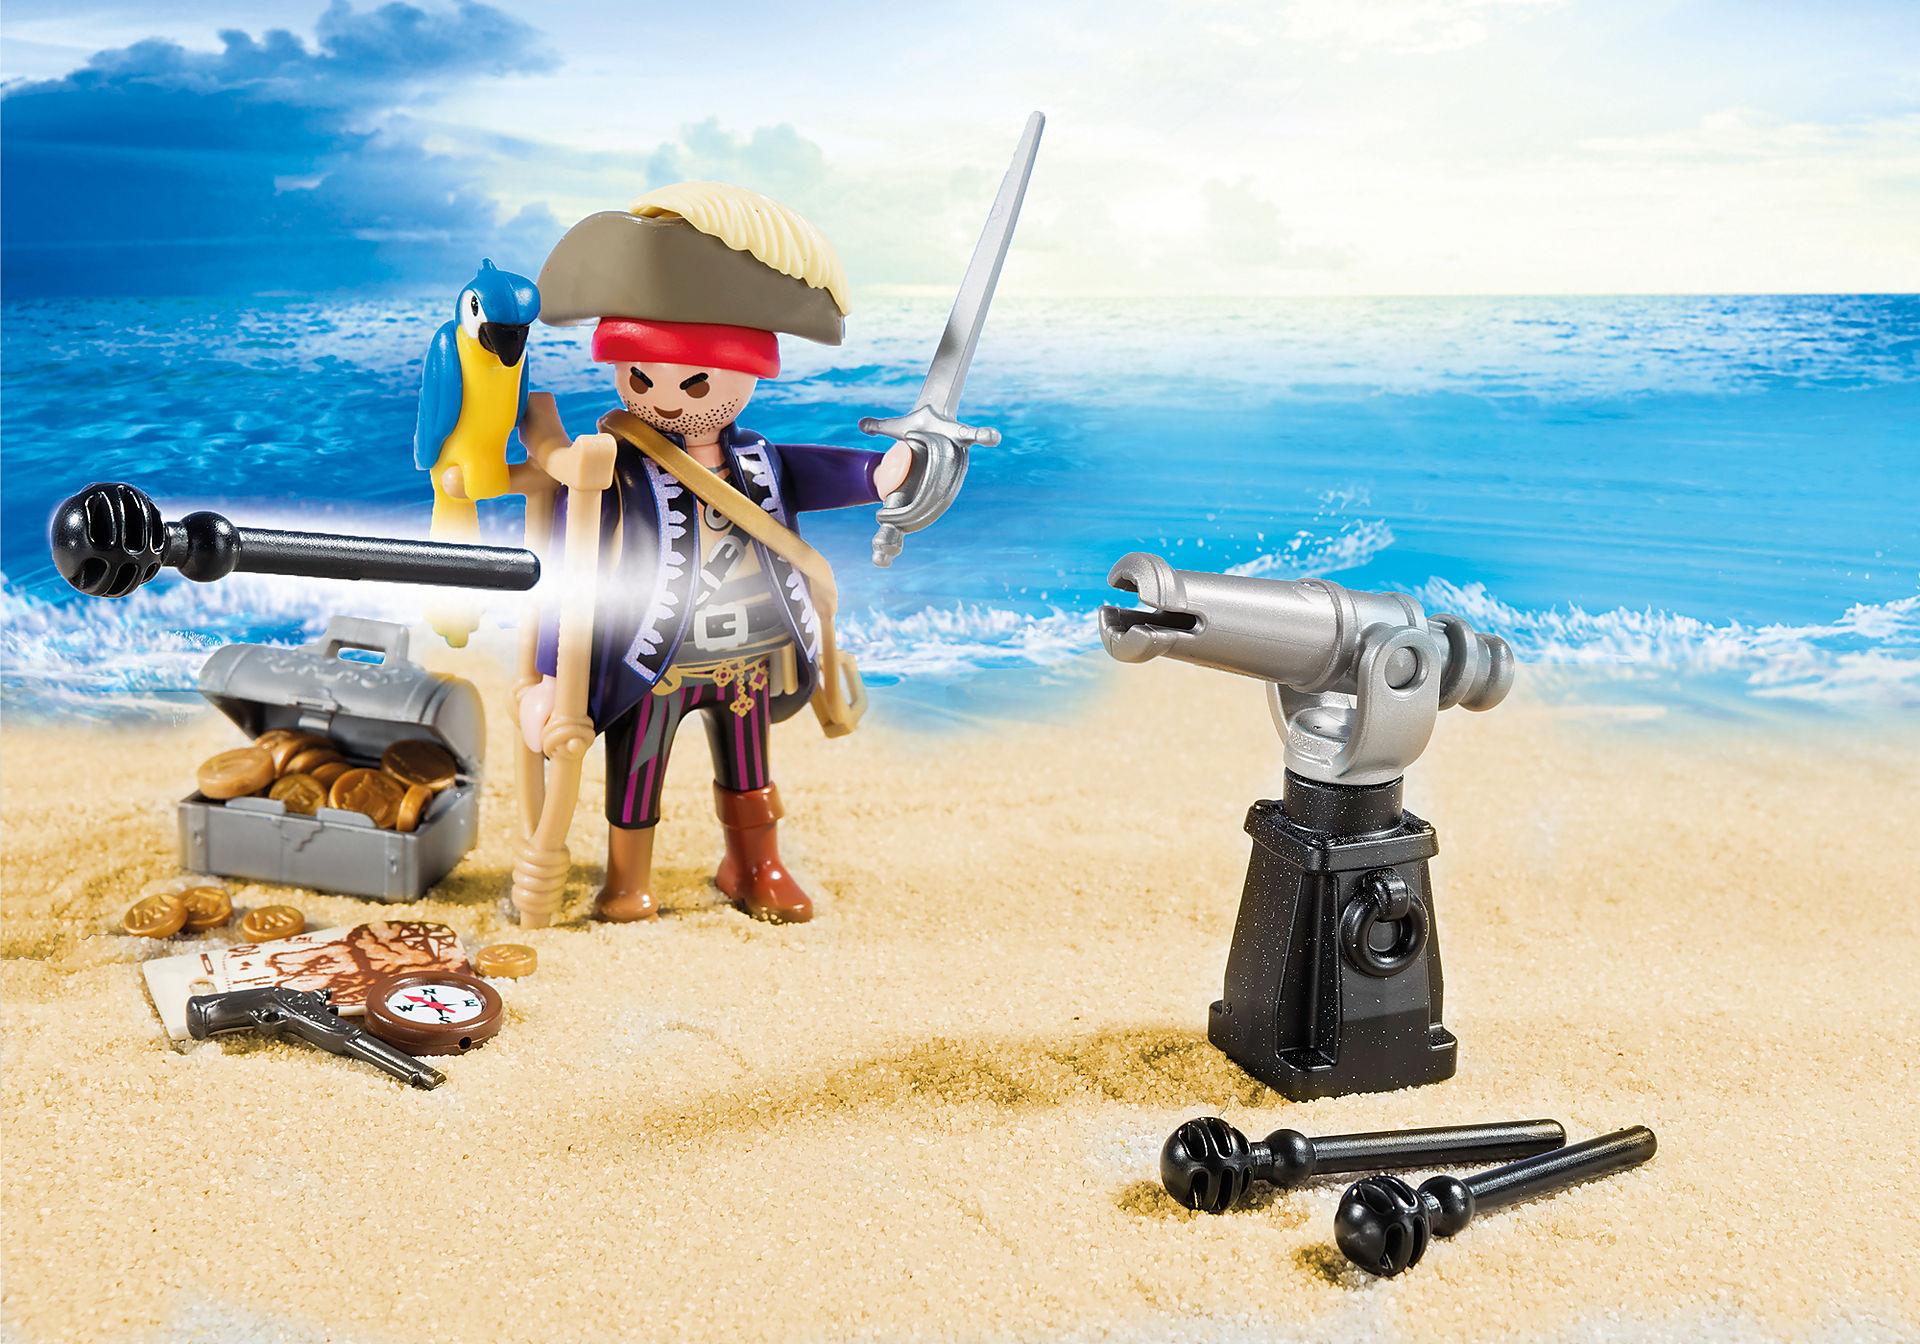 http://media.playmobil.com/i/playmobil/5658_product_extra2/Play Box - Pirates